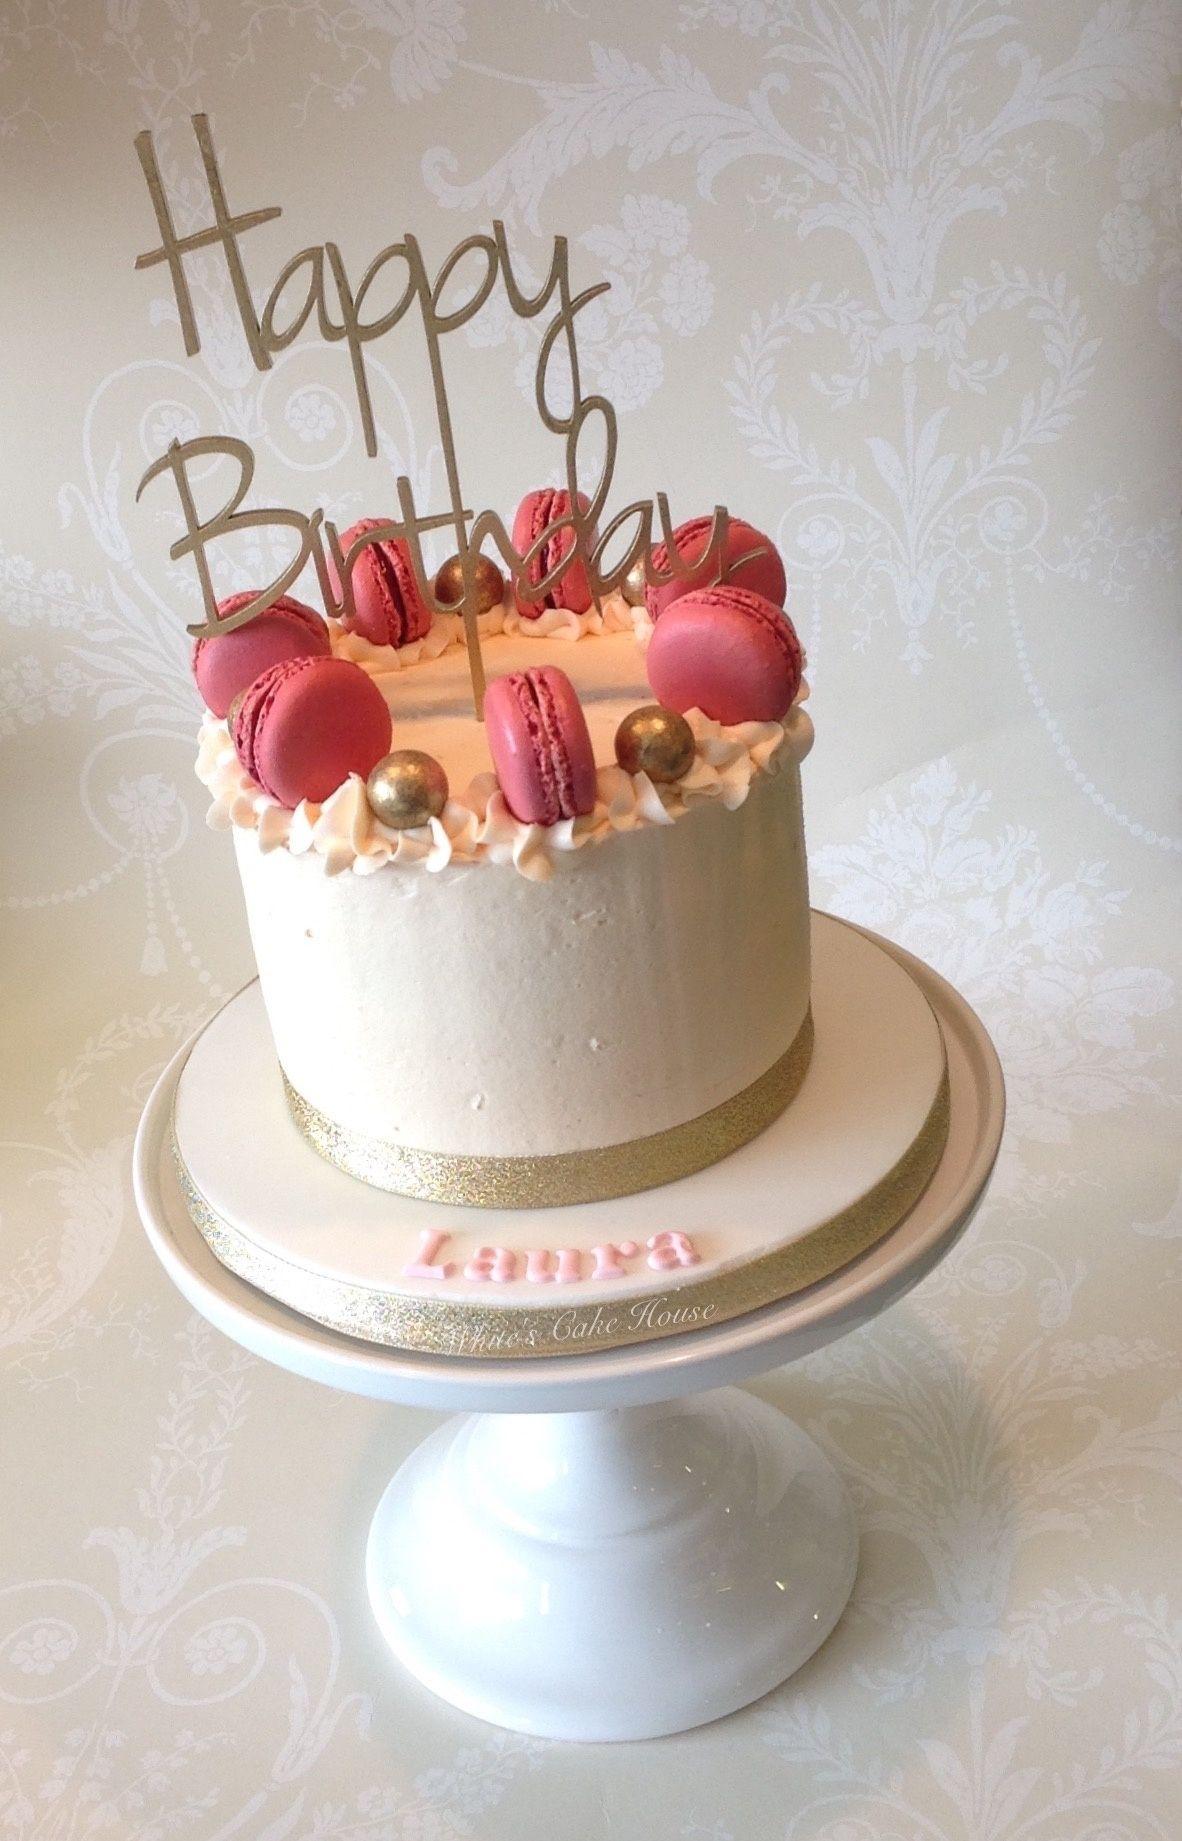 Excellent Birthday Cake Macarons Creative Birthdays Girls Of Birthday Cake Funny Birthday Cards Online Elaedamsfinfo